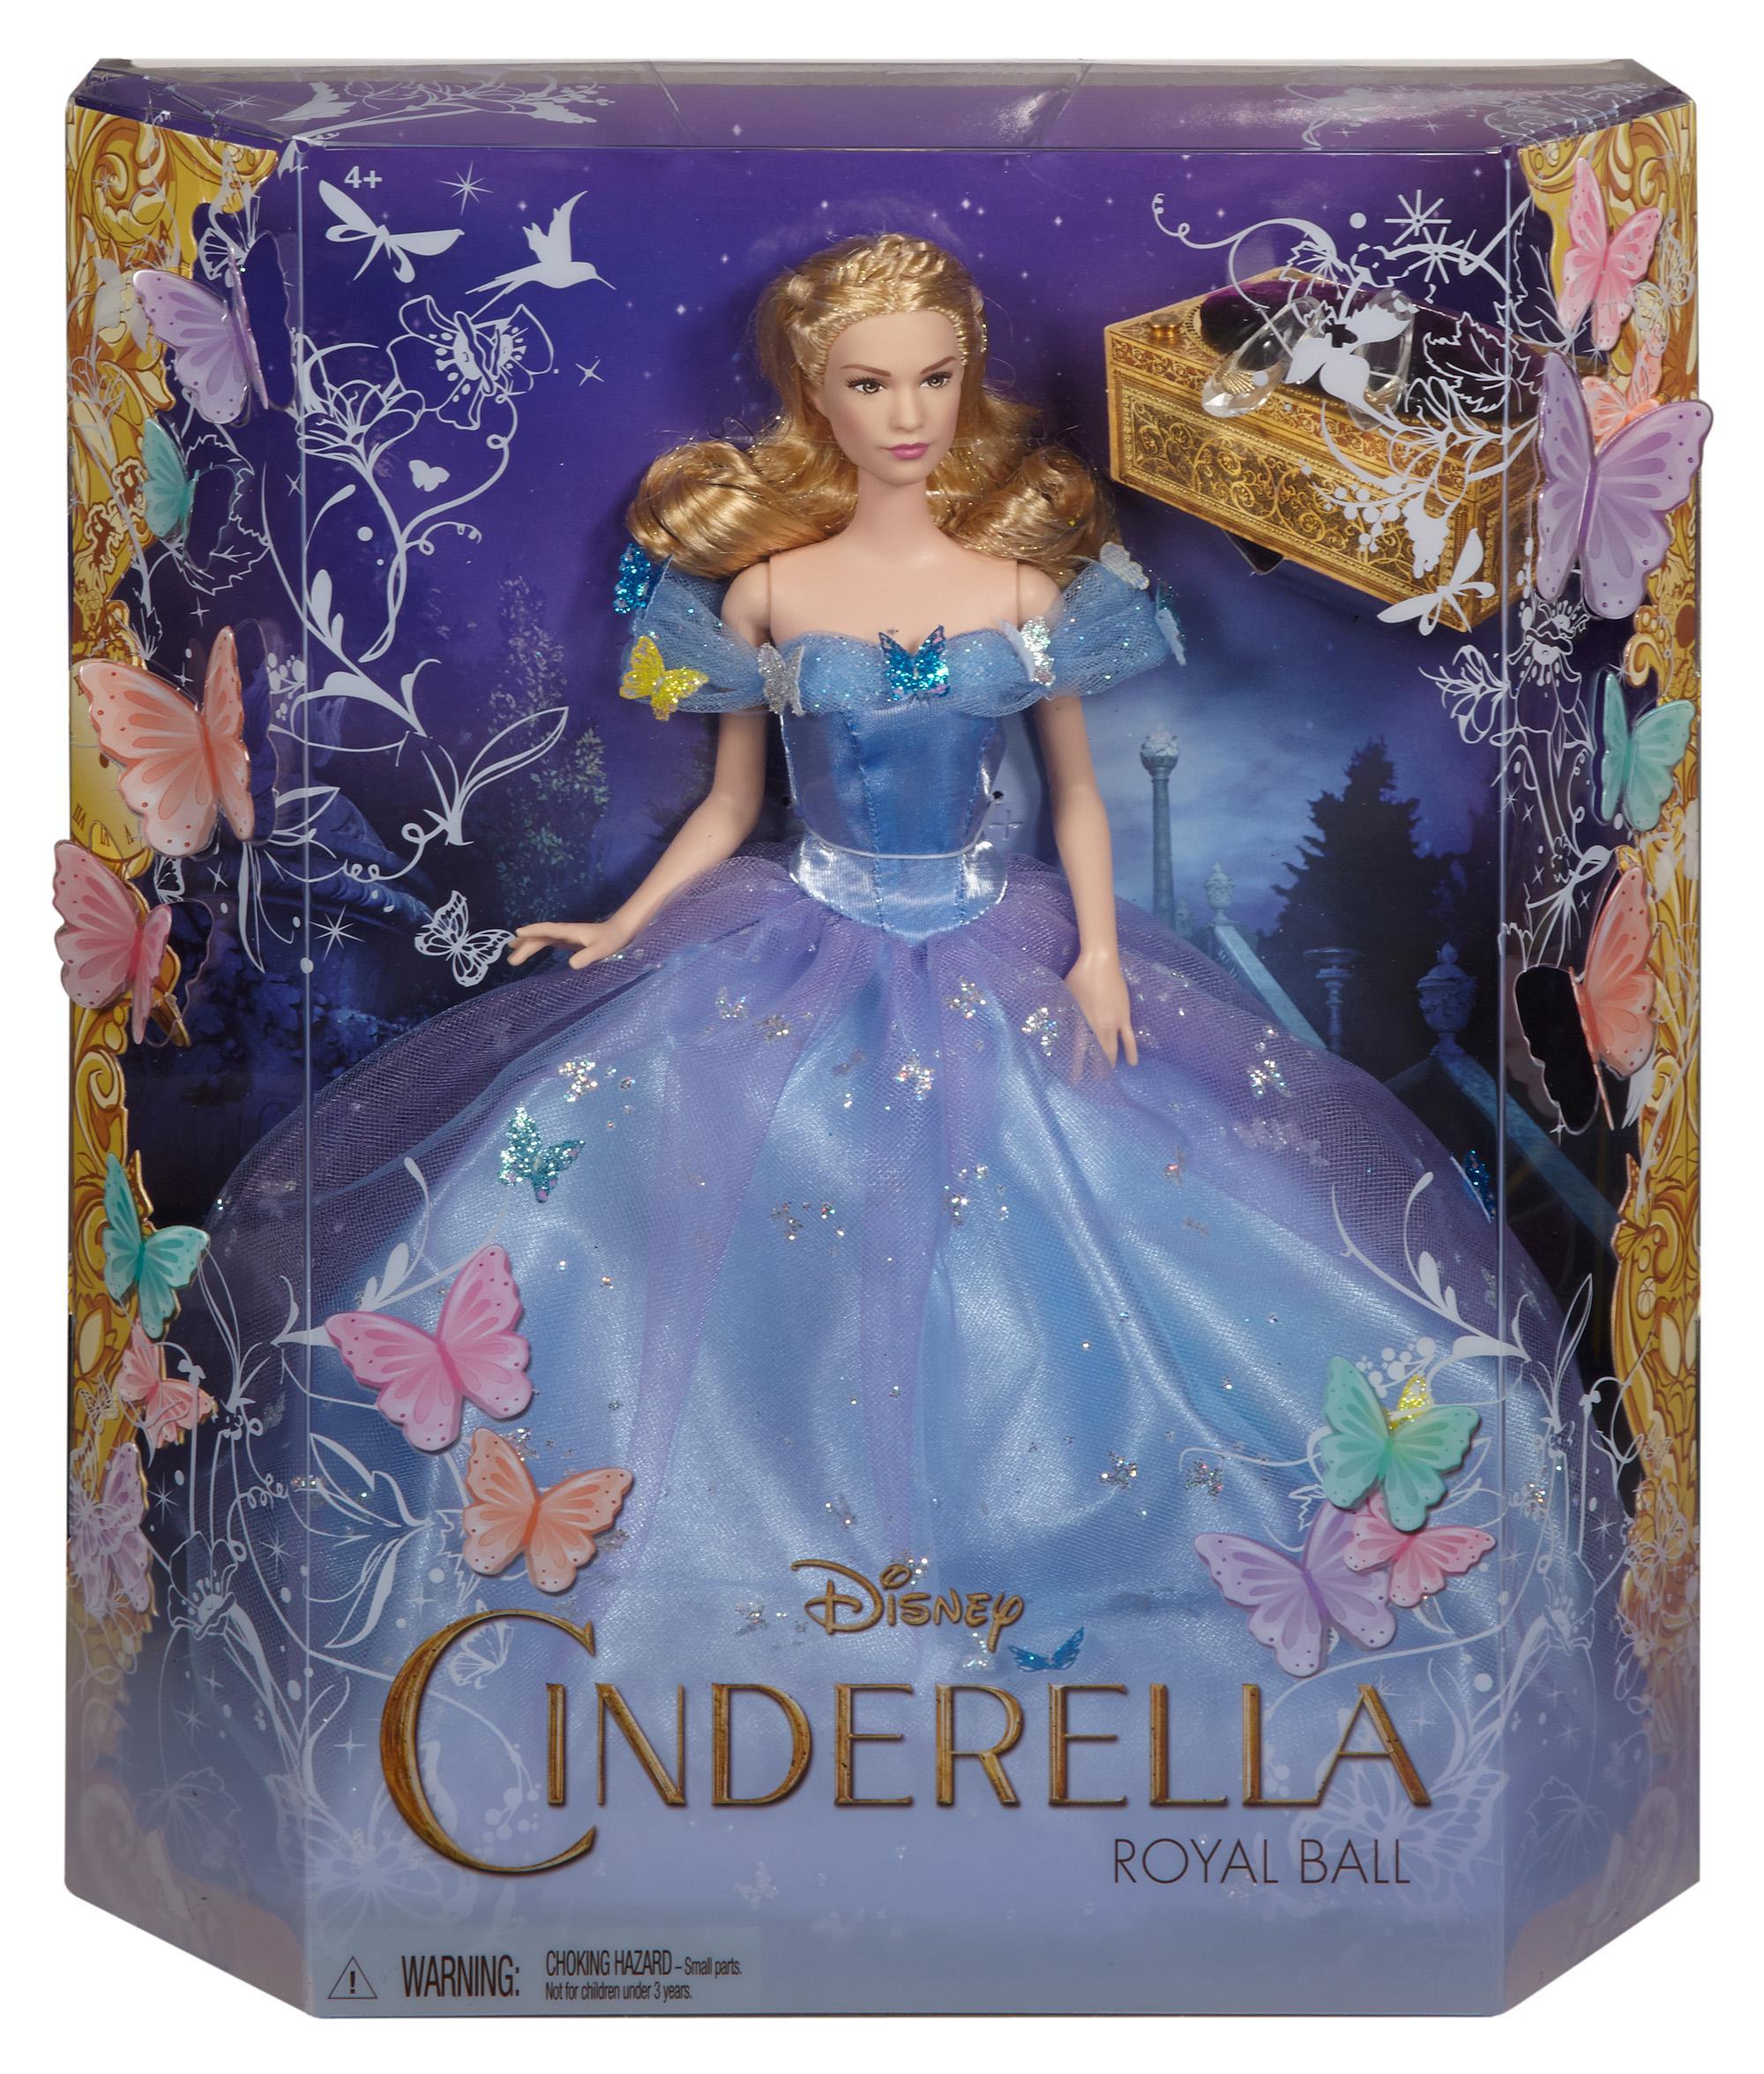 Disney Princess Royal Ball Cinderella Doll